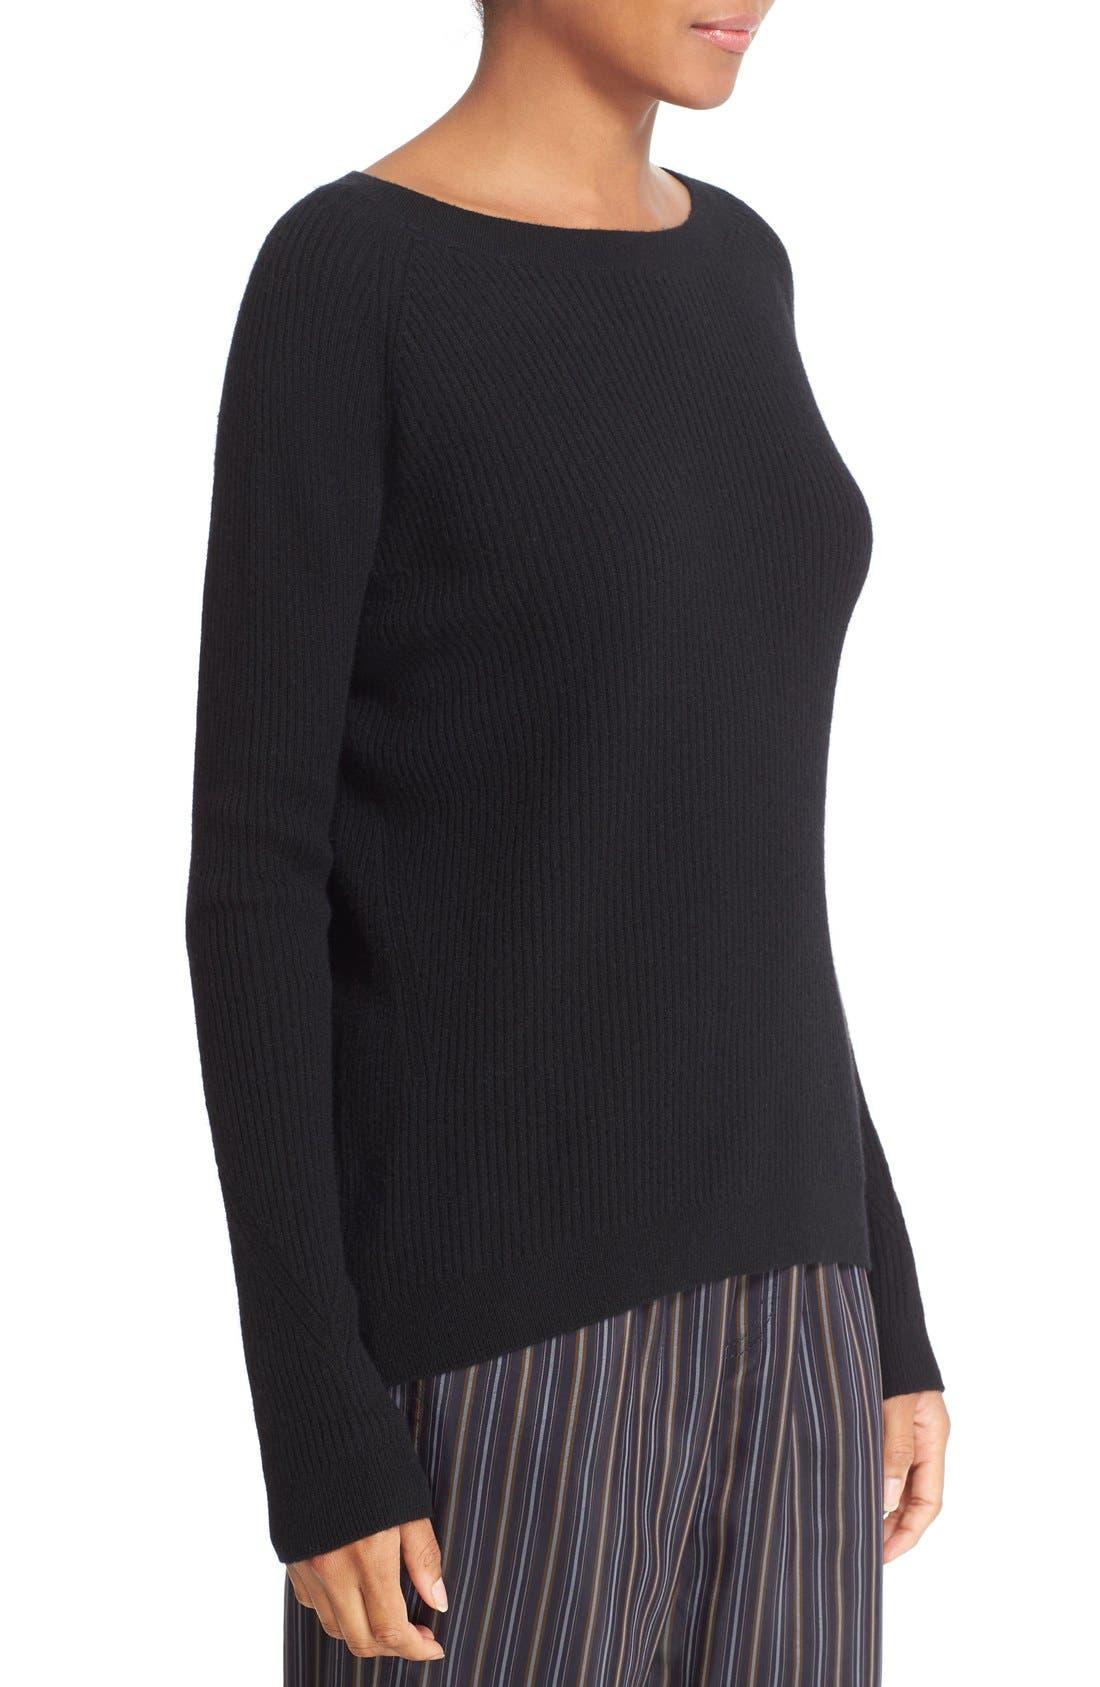 VINCE, Rib Knit Raglan Sleeve Cashmere Sweater, Alternate thumbnail 3, color, 001